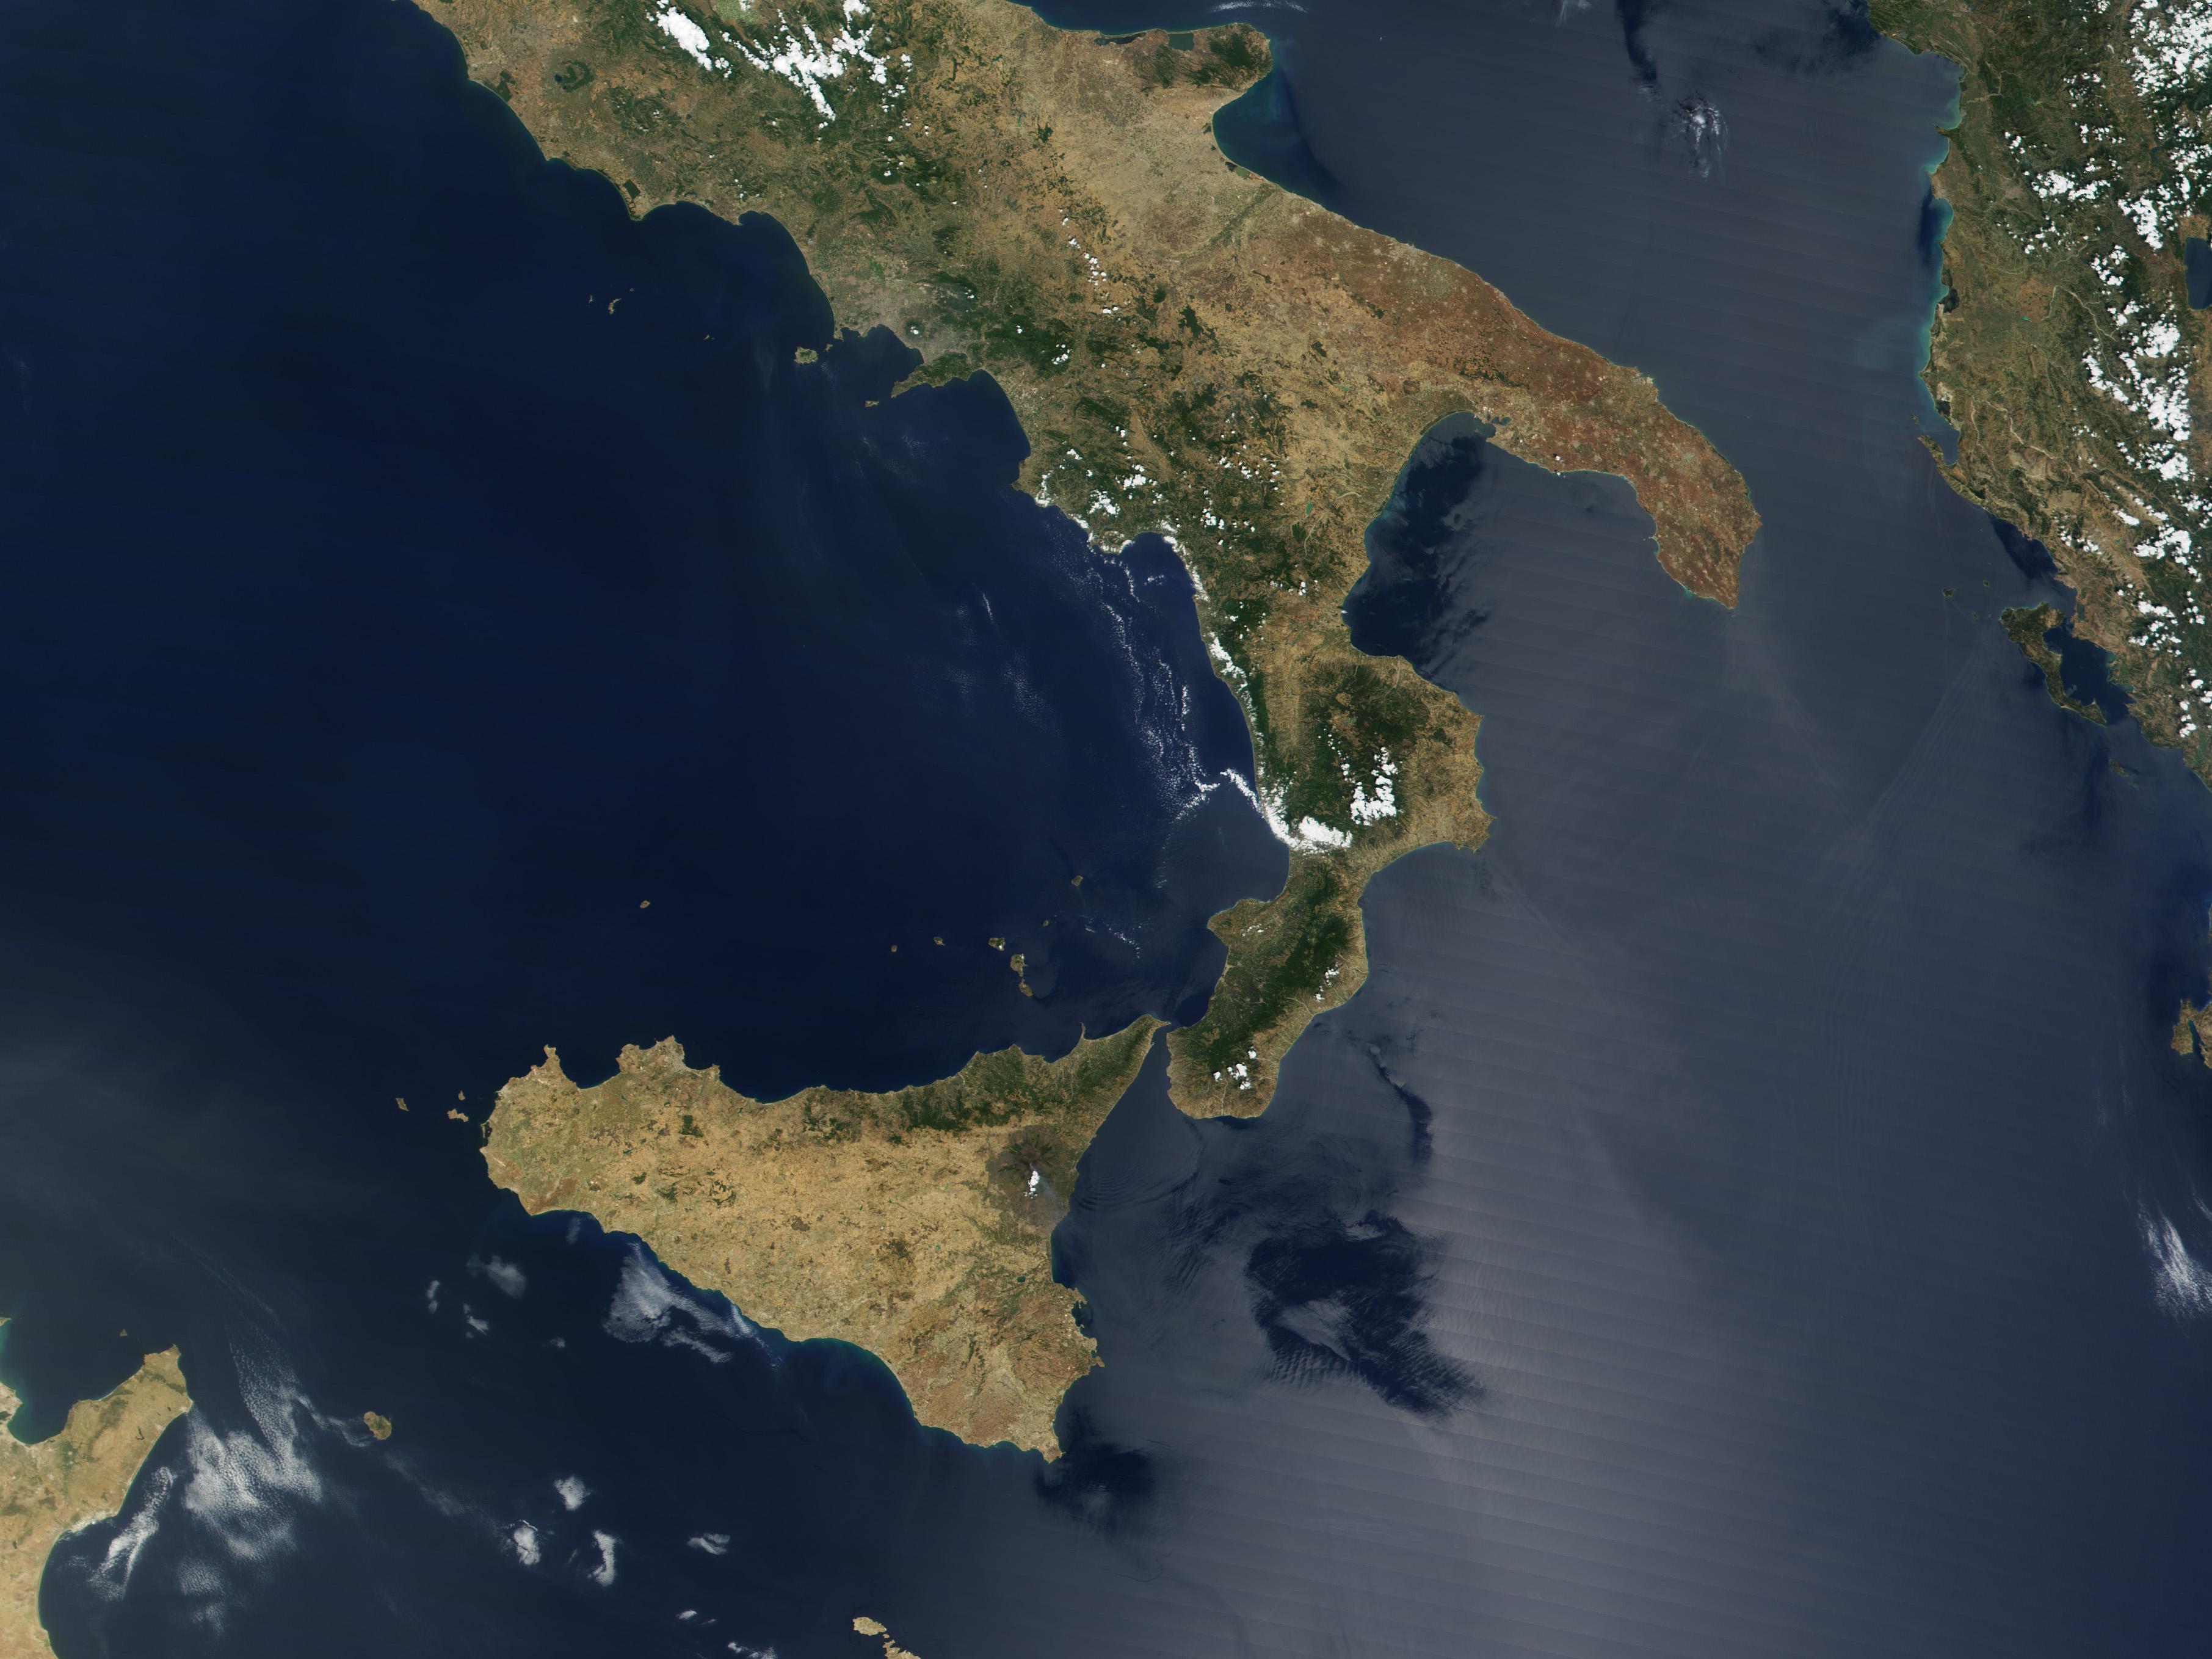 Zoom into Mount Etna